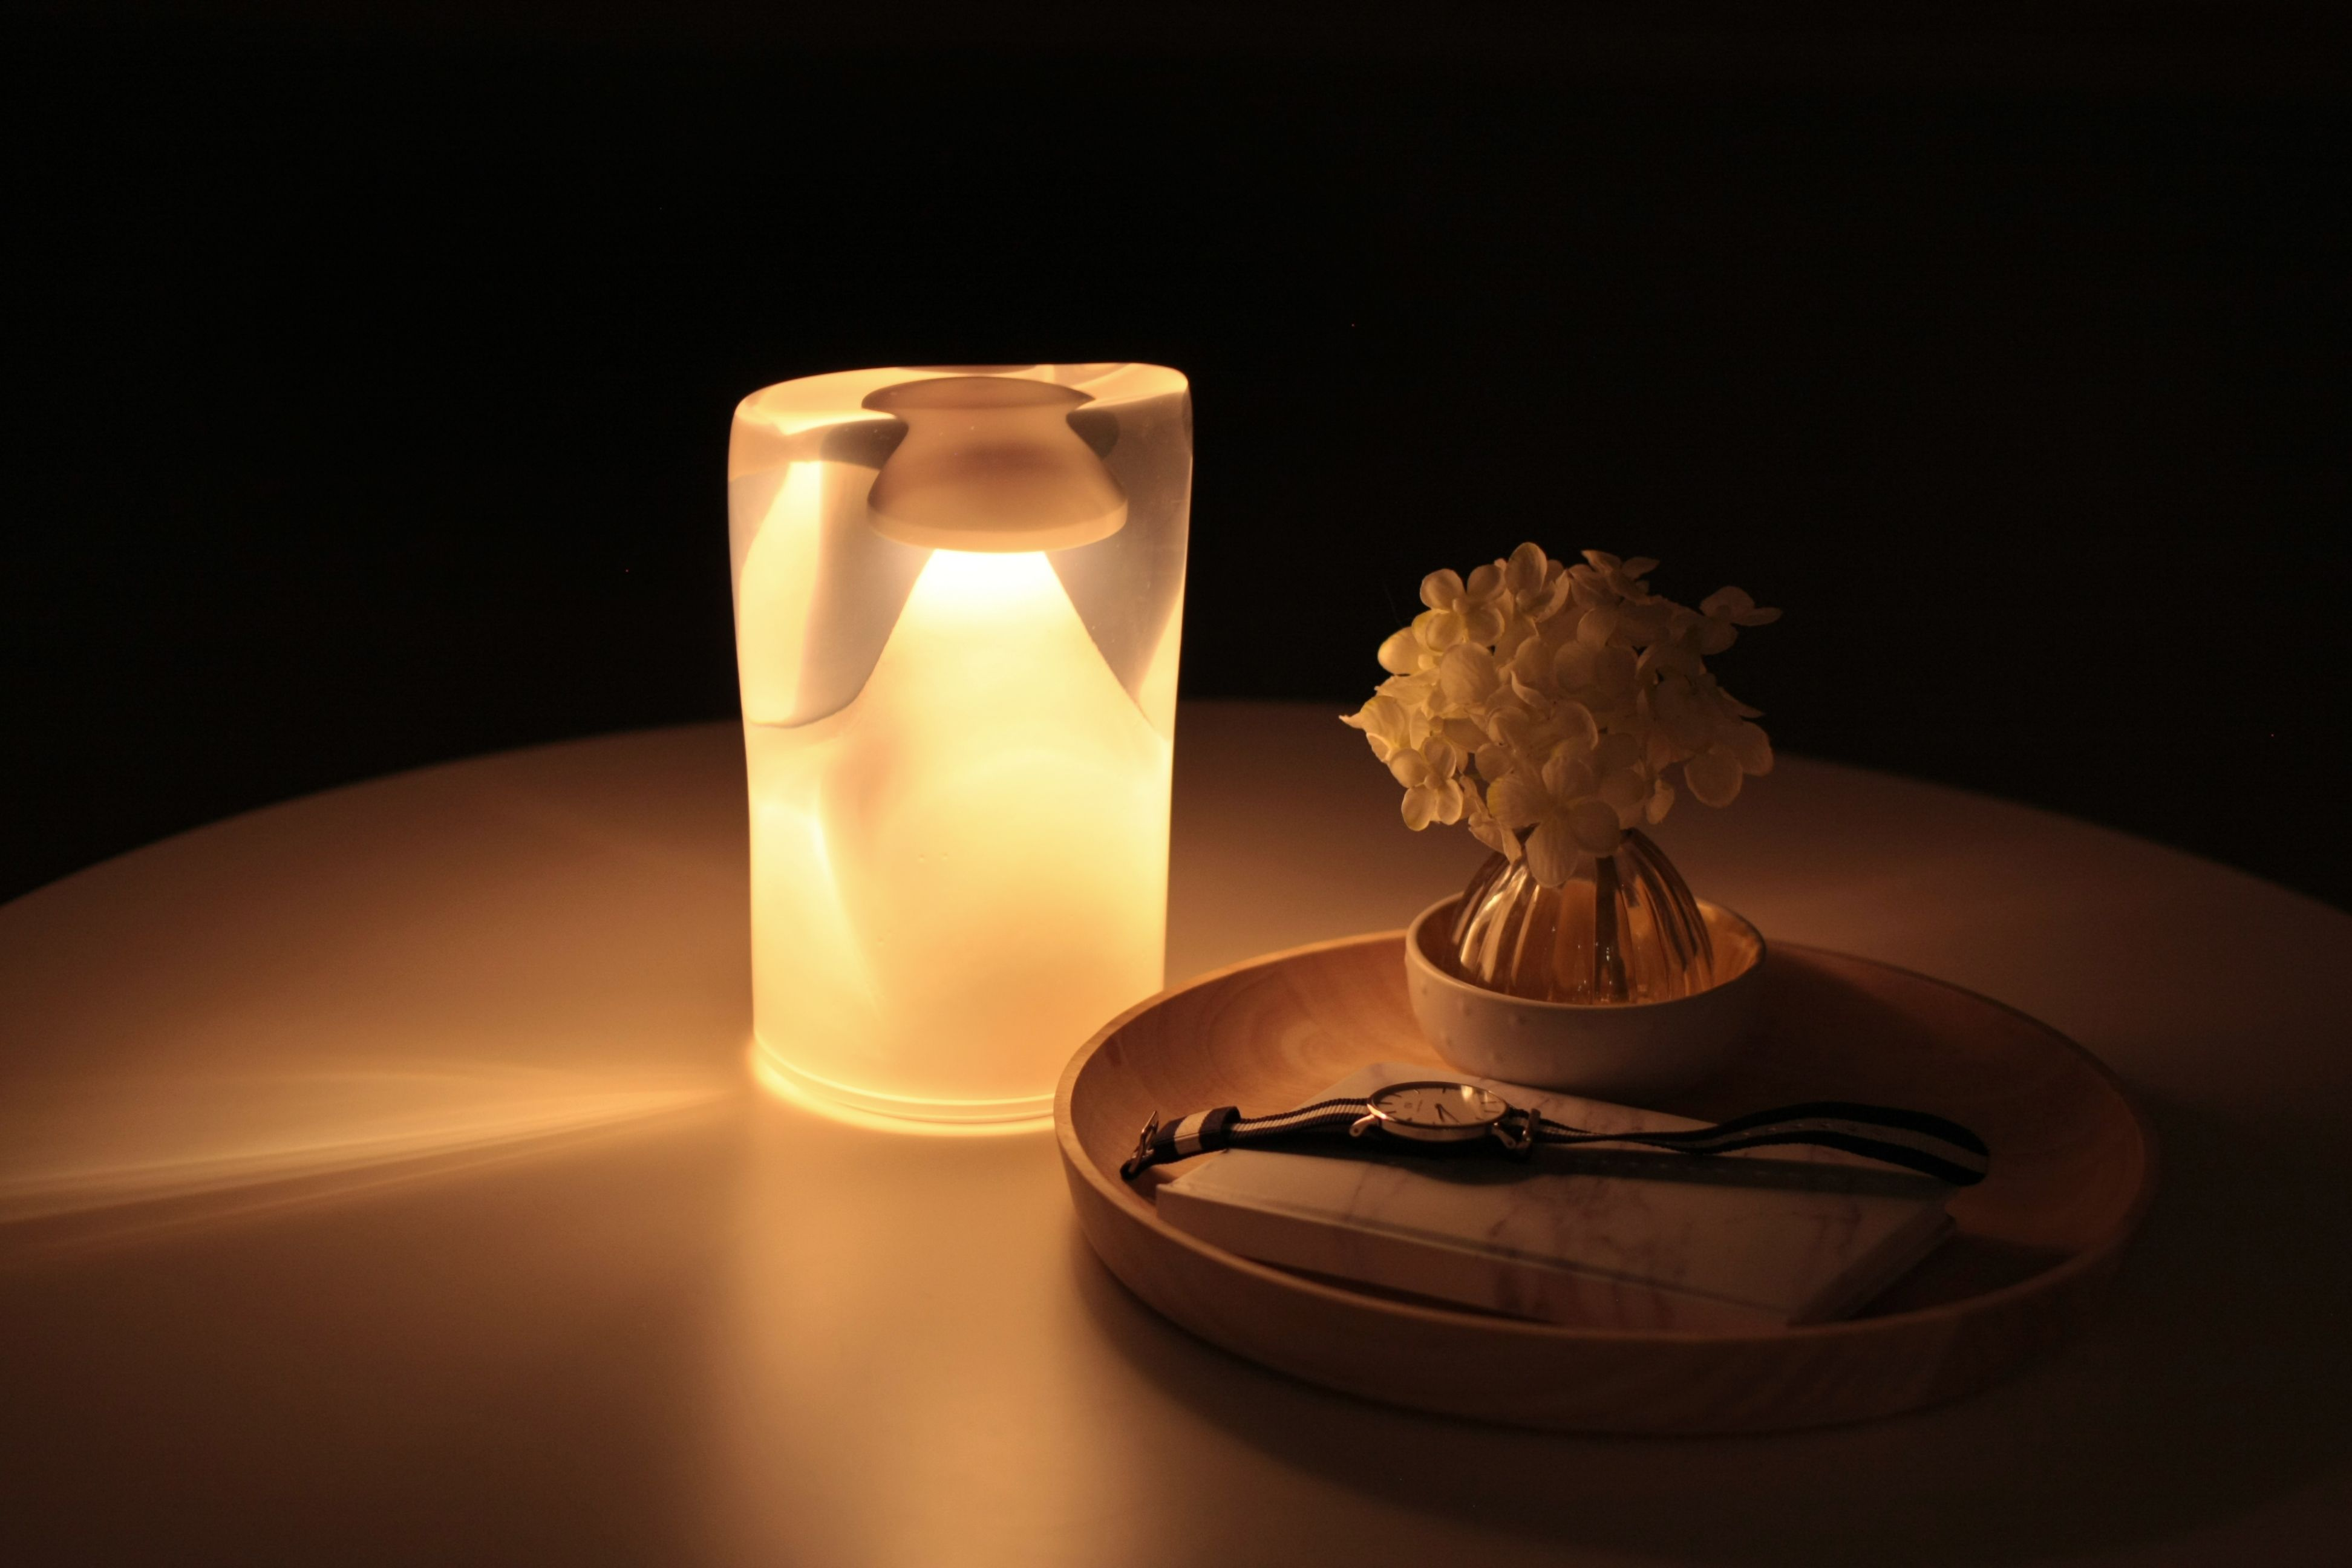 Www Neoz Com Neoz Cordless Lamp the neoz medusa cordless lamp looks absolutely divine as